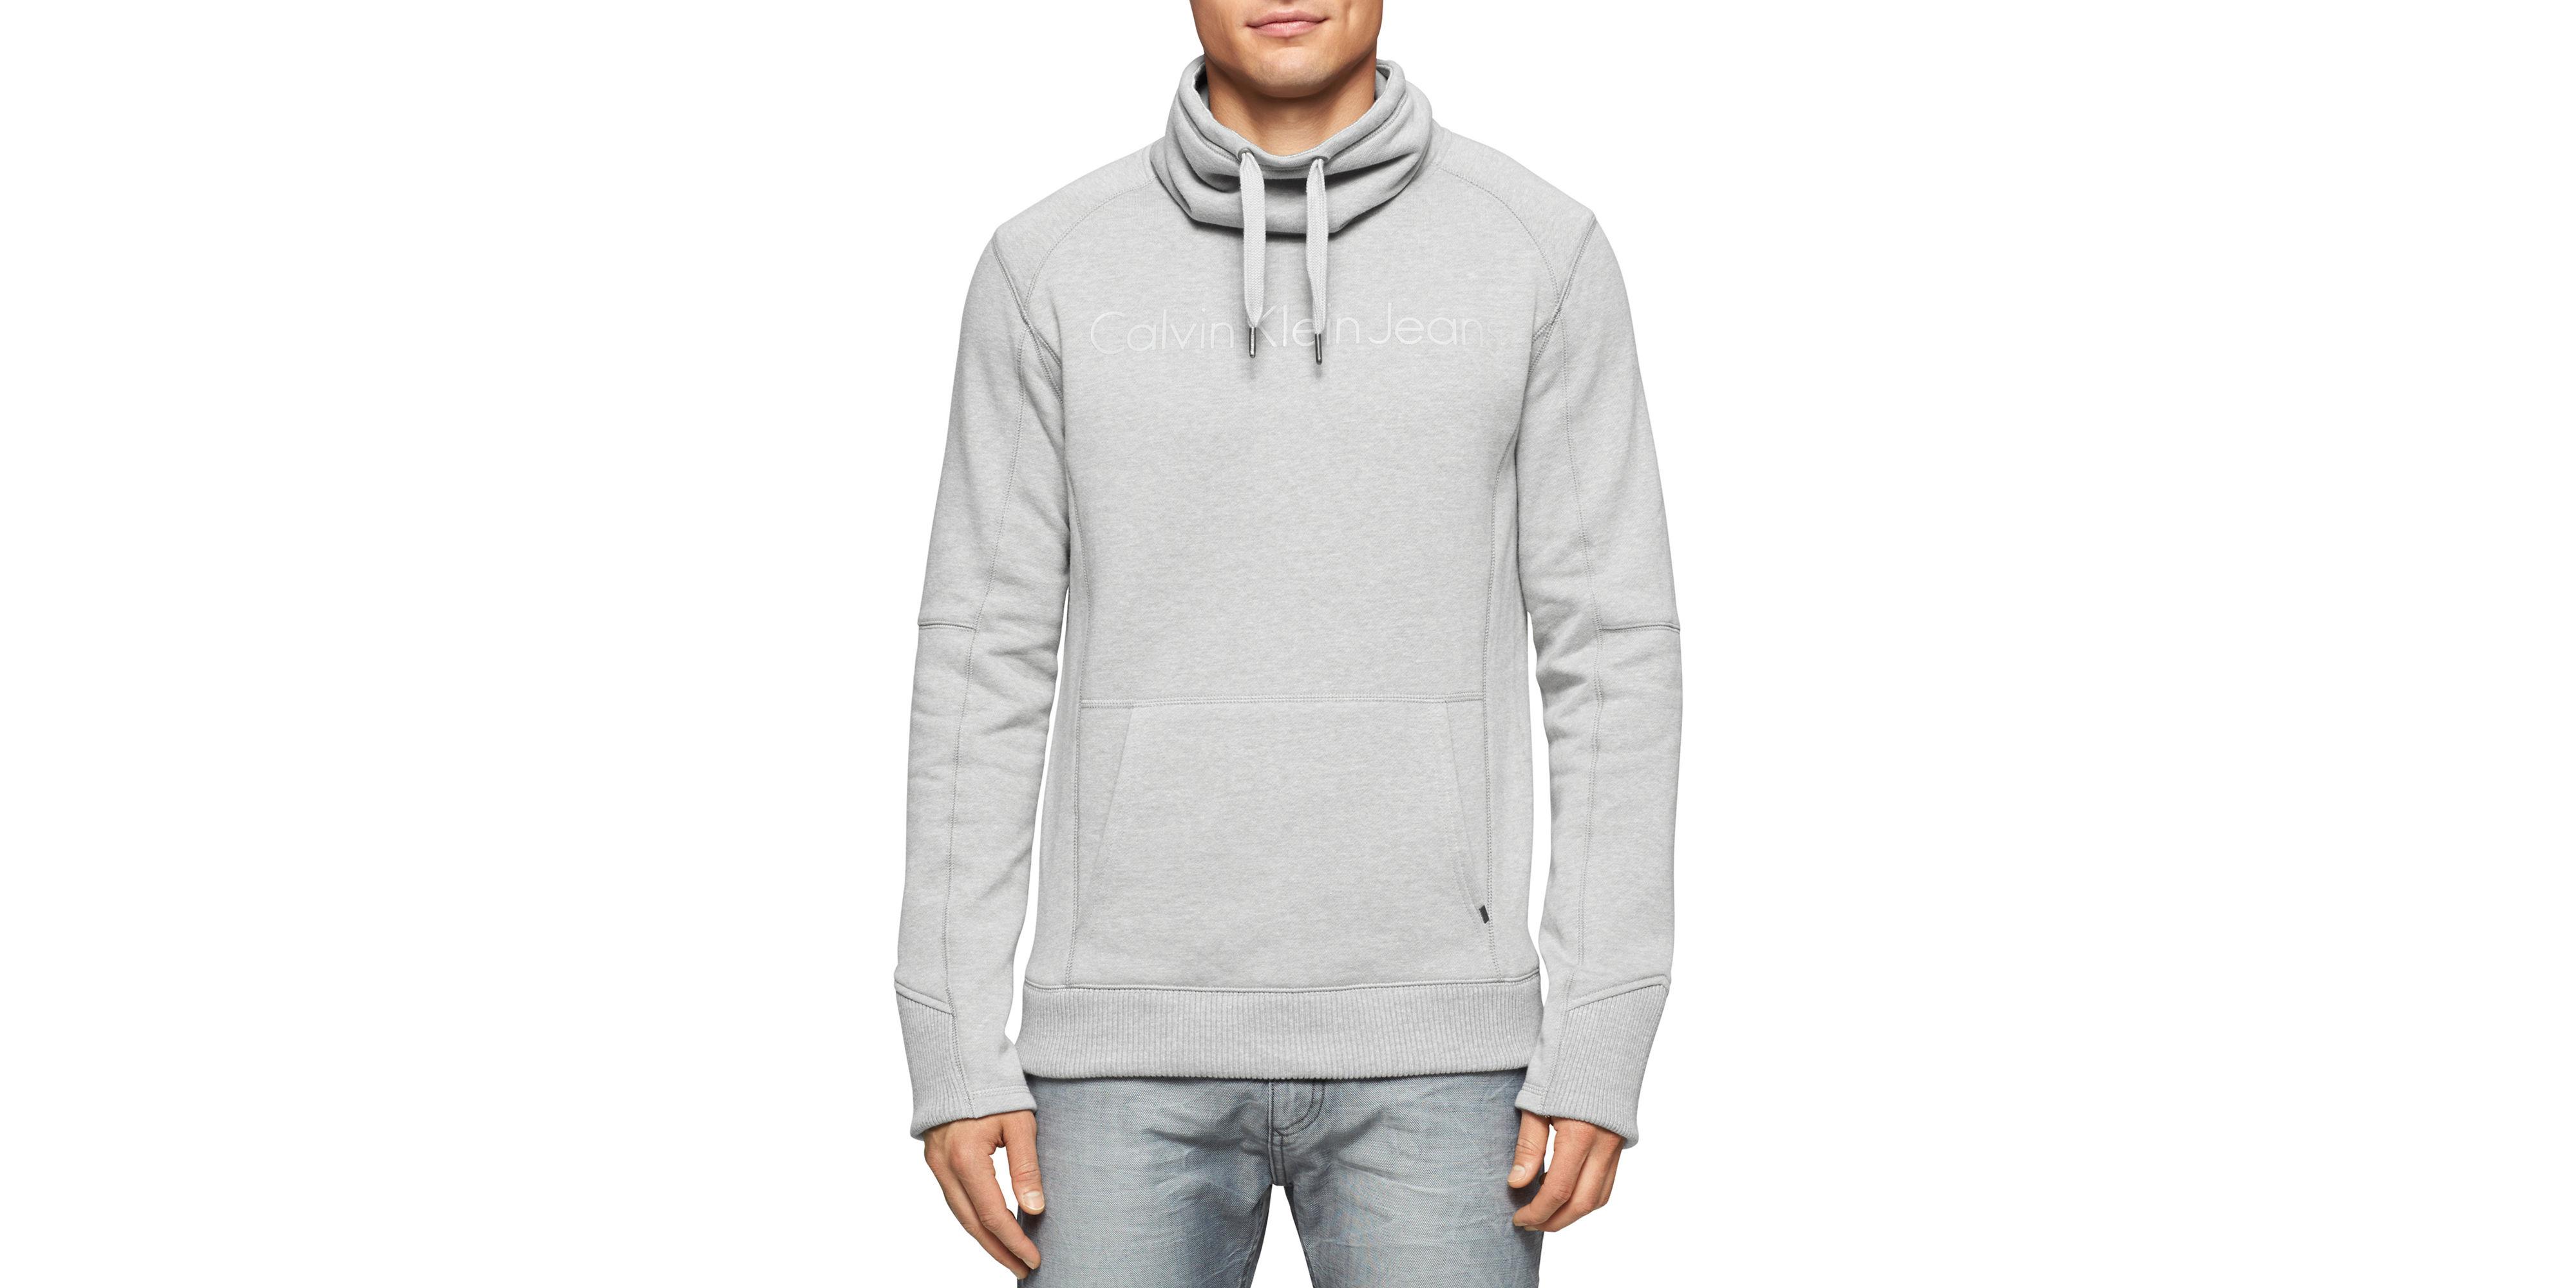 calvin klein jeans fleece funnel neck sweater in gray for. Black Bedroom Furniture Sets. Home Design Ideas